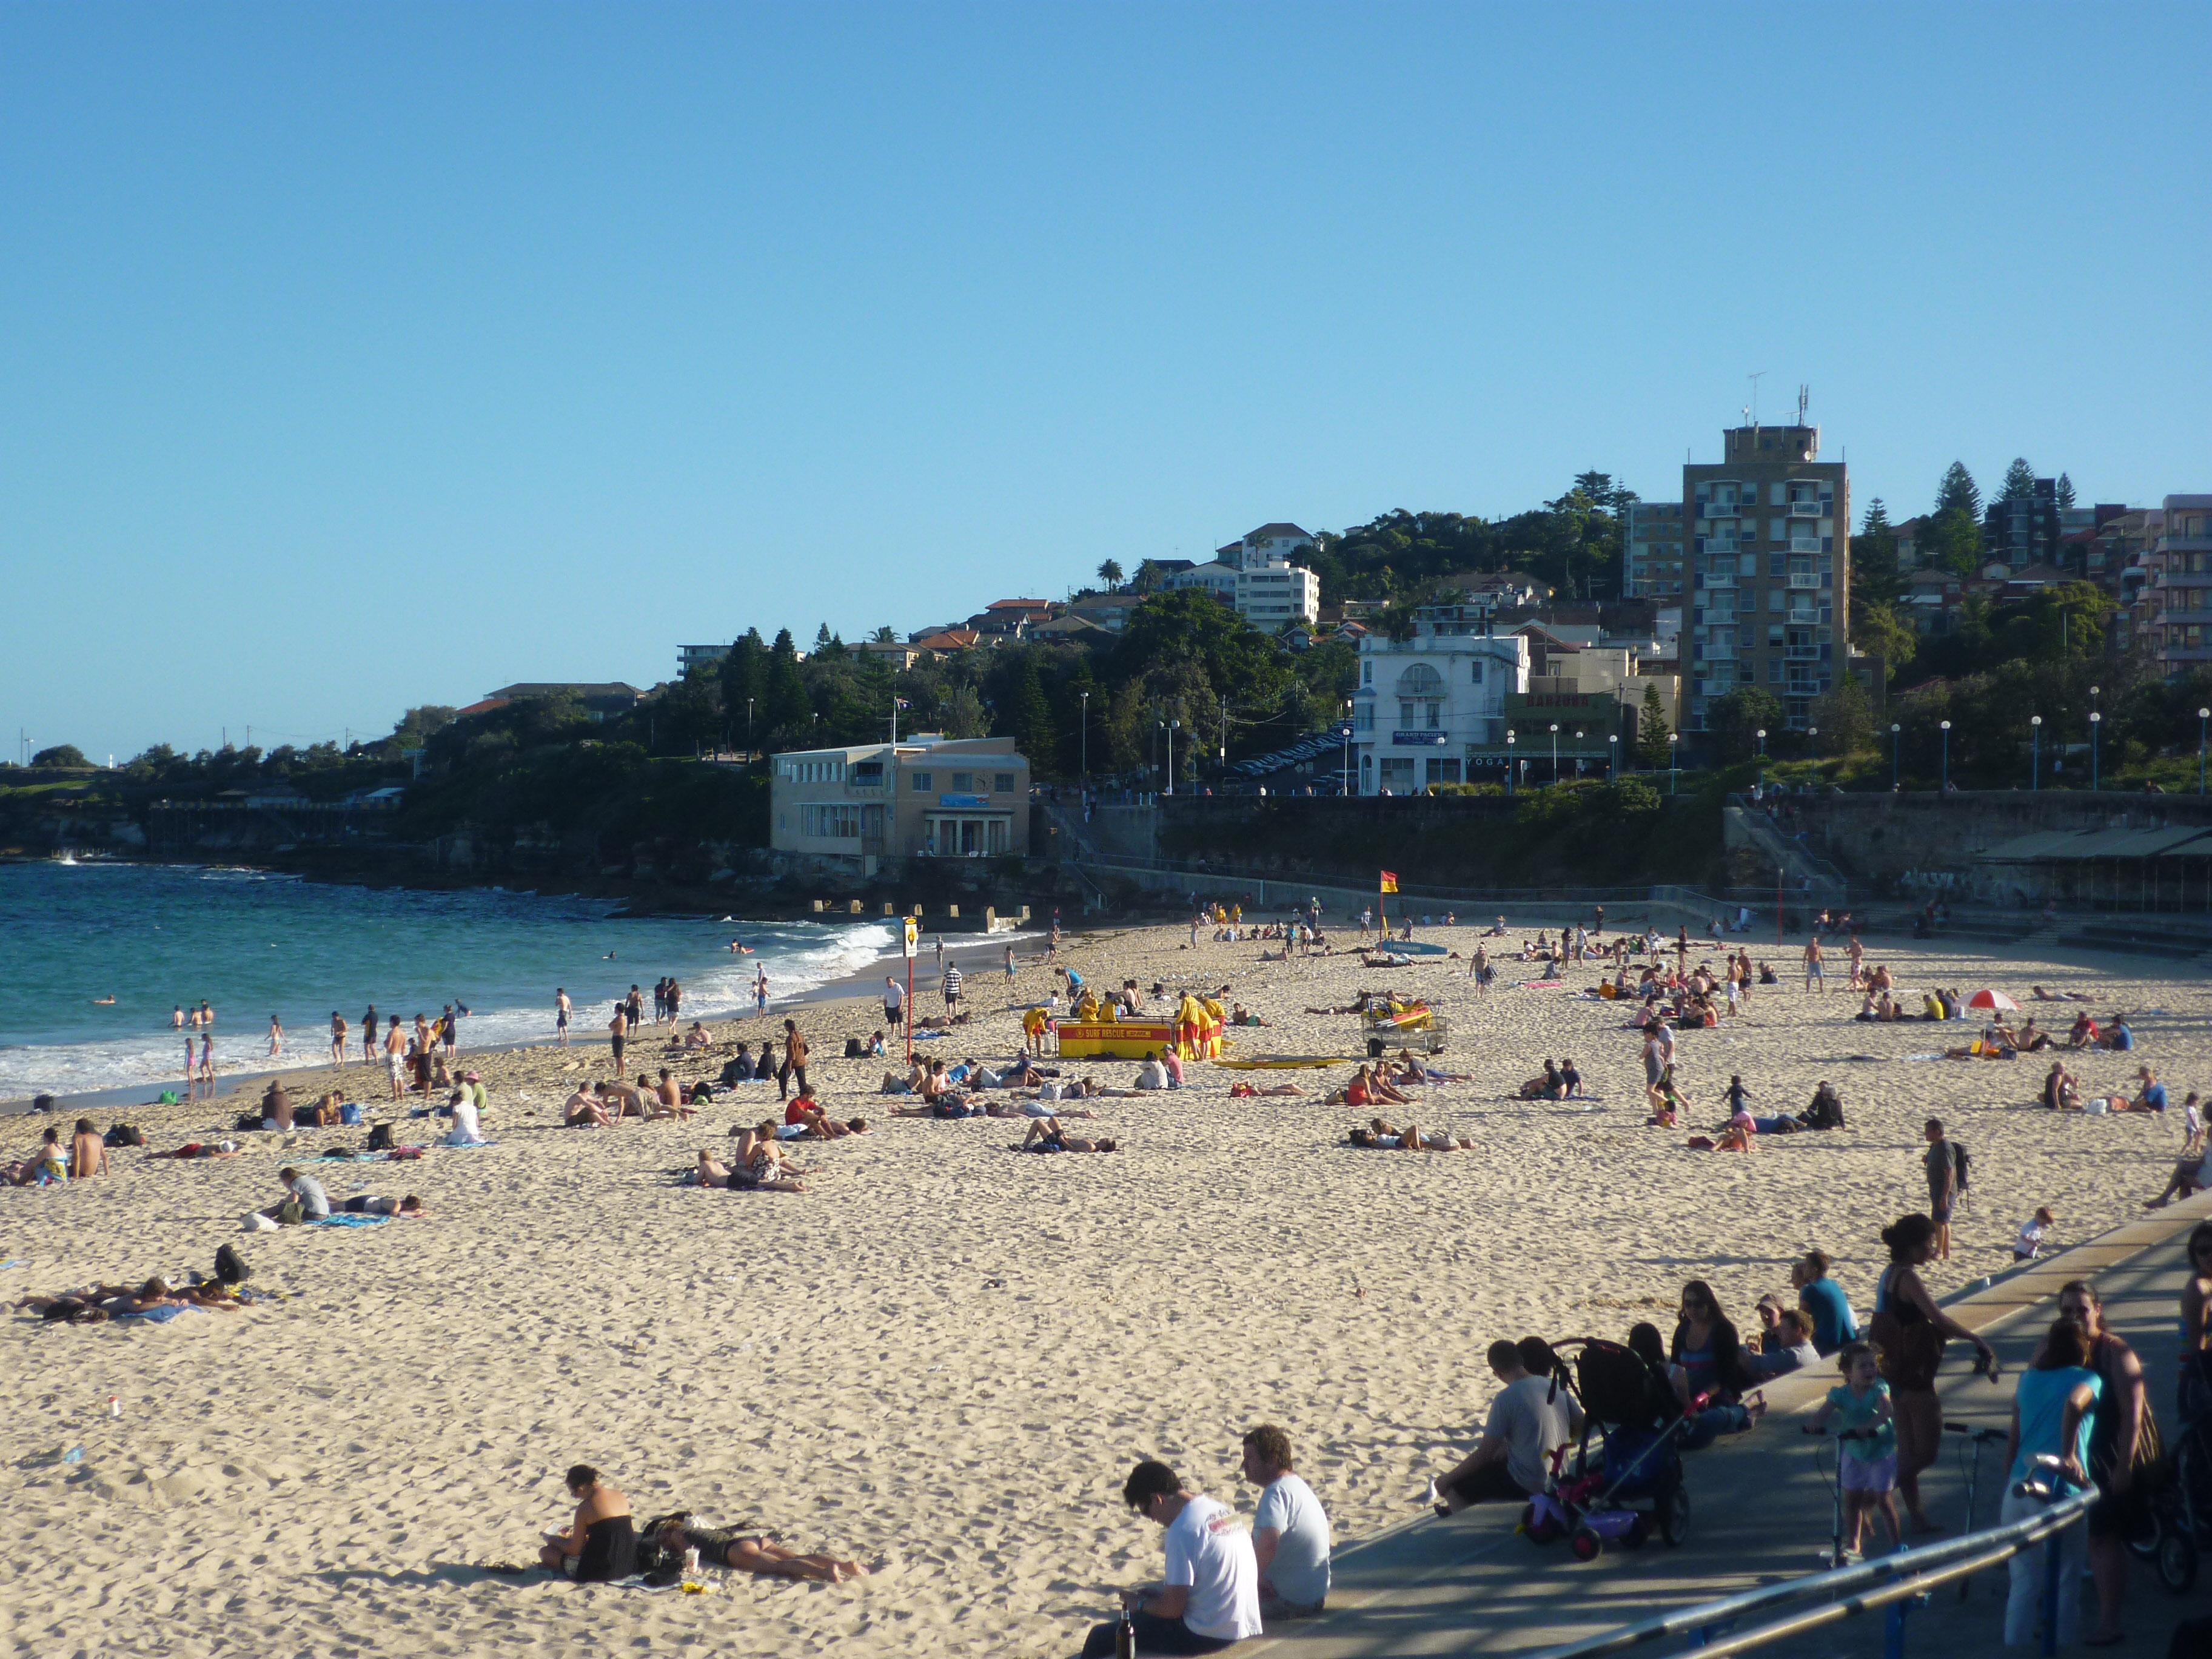 Most beautiful universities in Australia - University of New South Wales